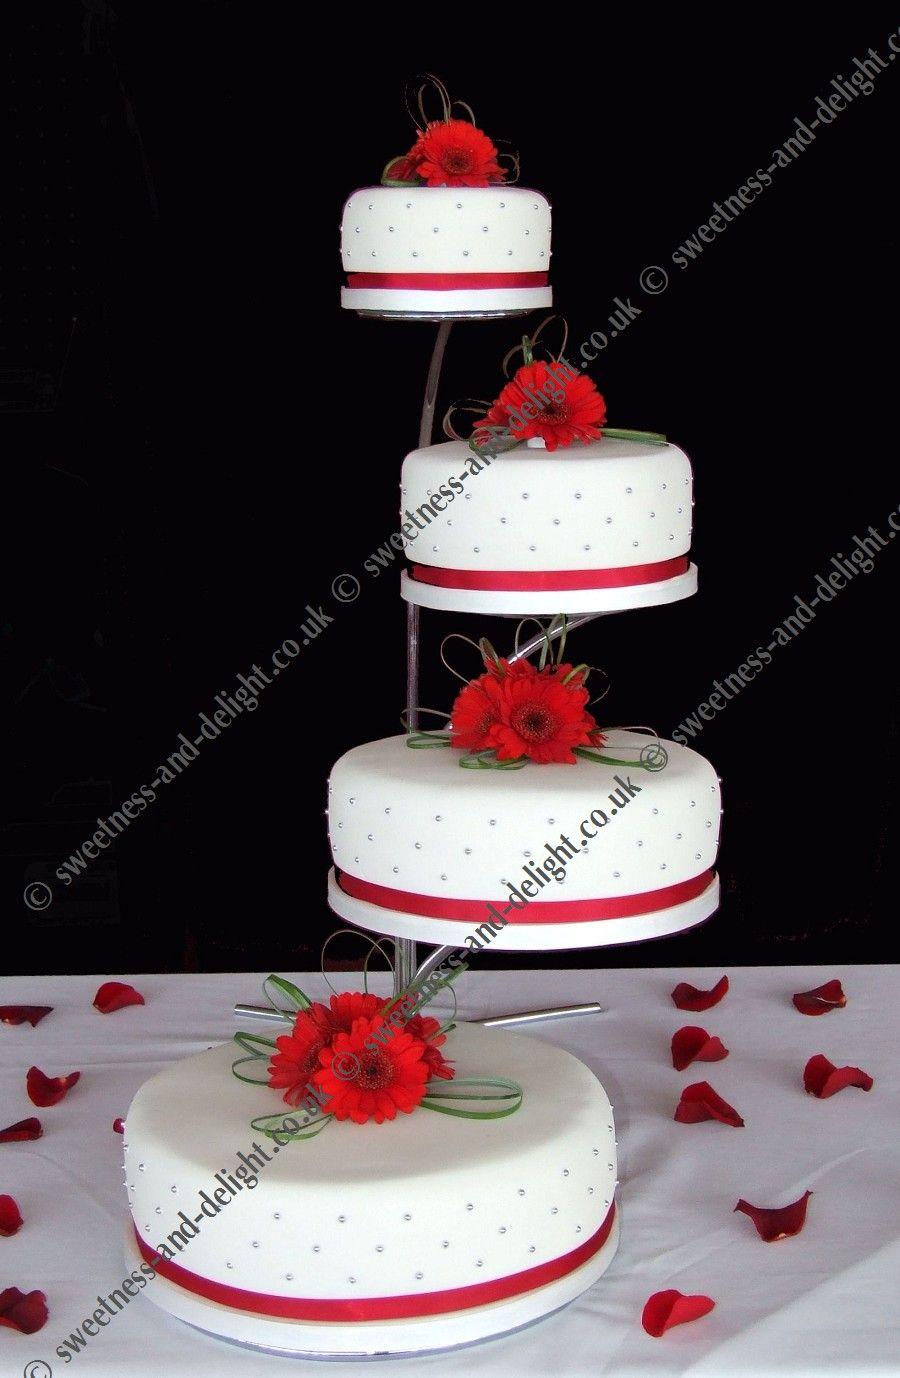 Wedding And Celebration Cakes In Milton Keynes Buckinghamshire Cake Stand Hire